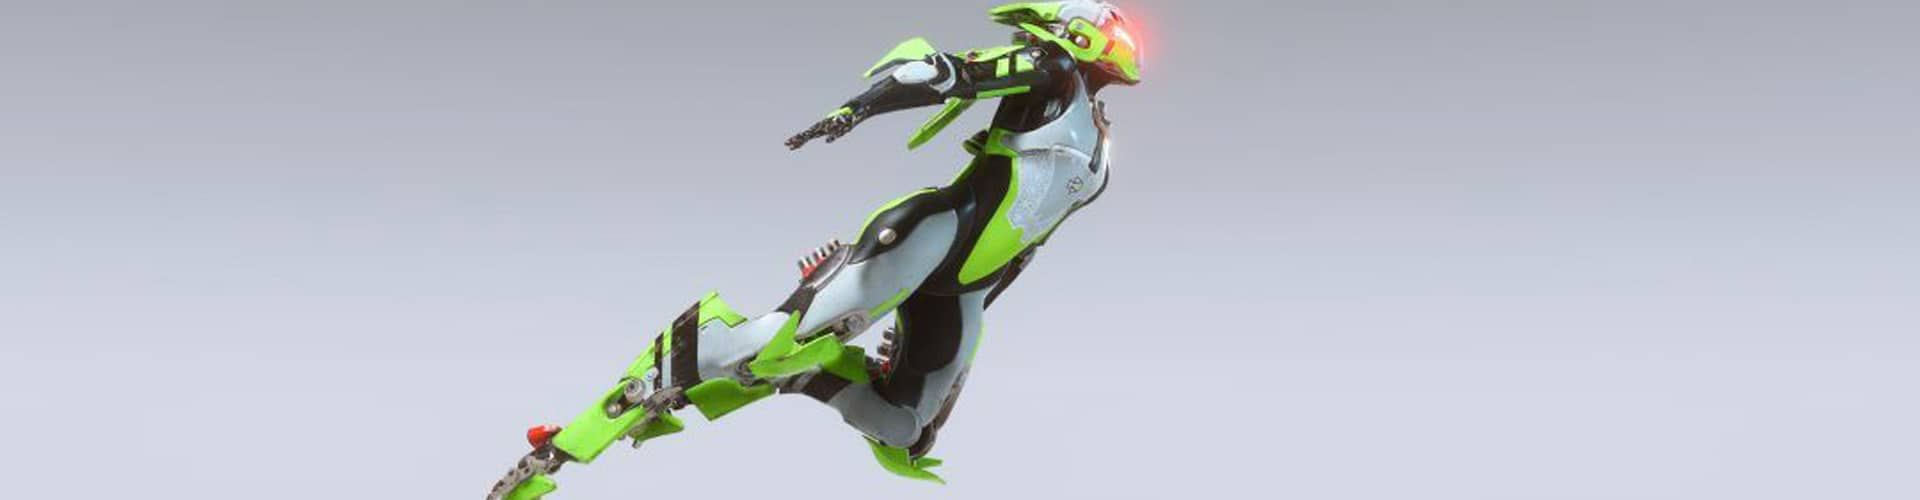 Anthem: Interceptor Javelin Guide